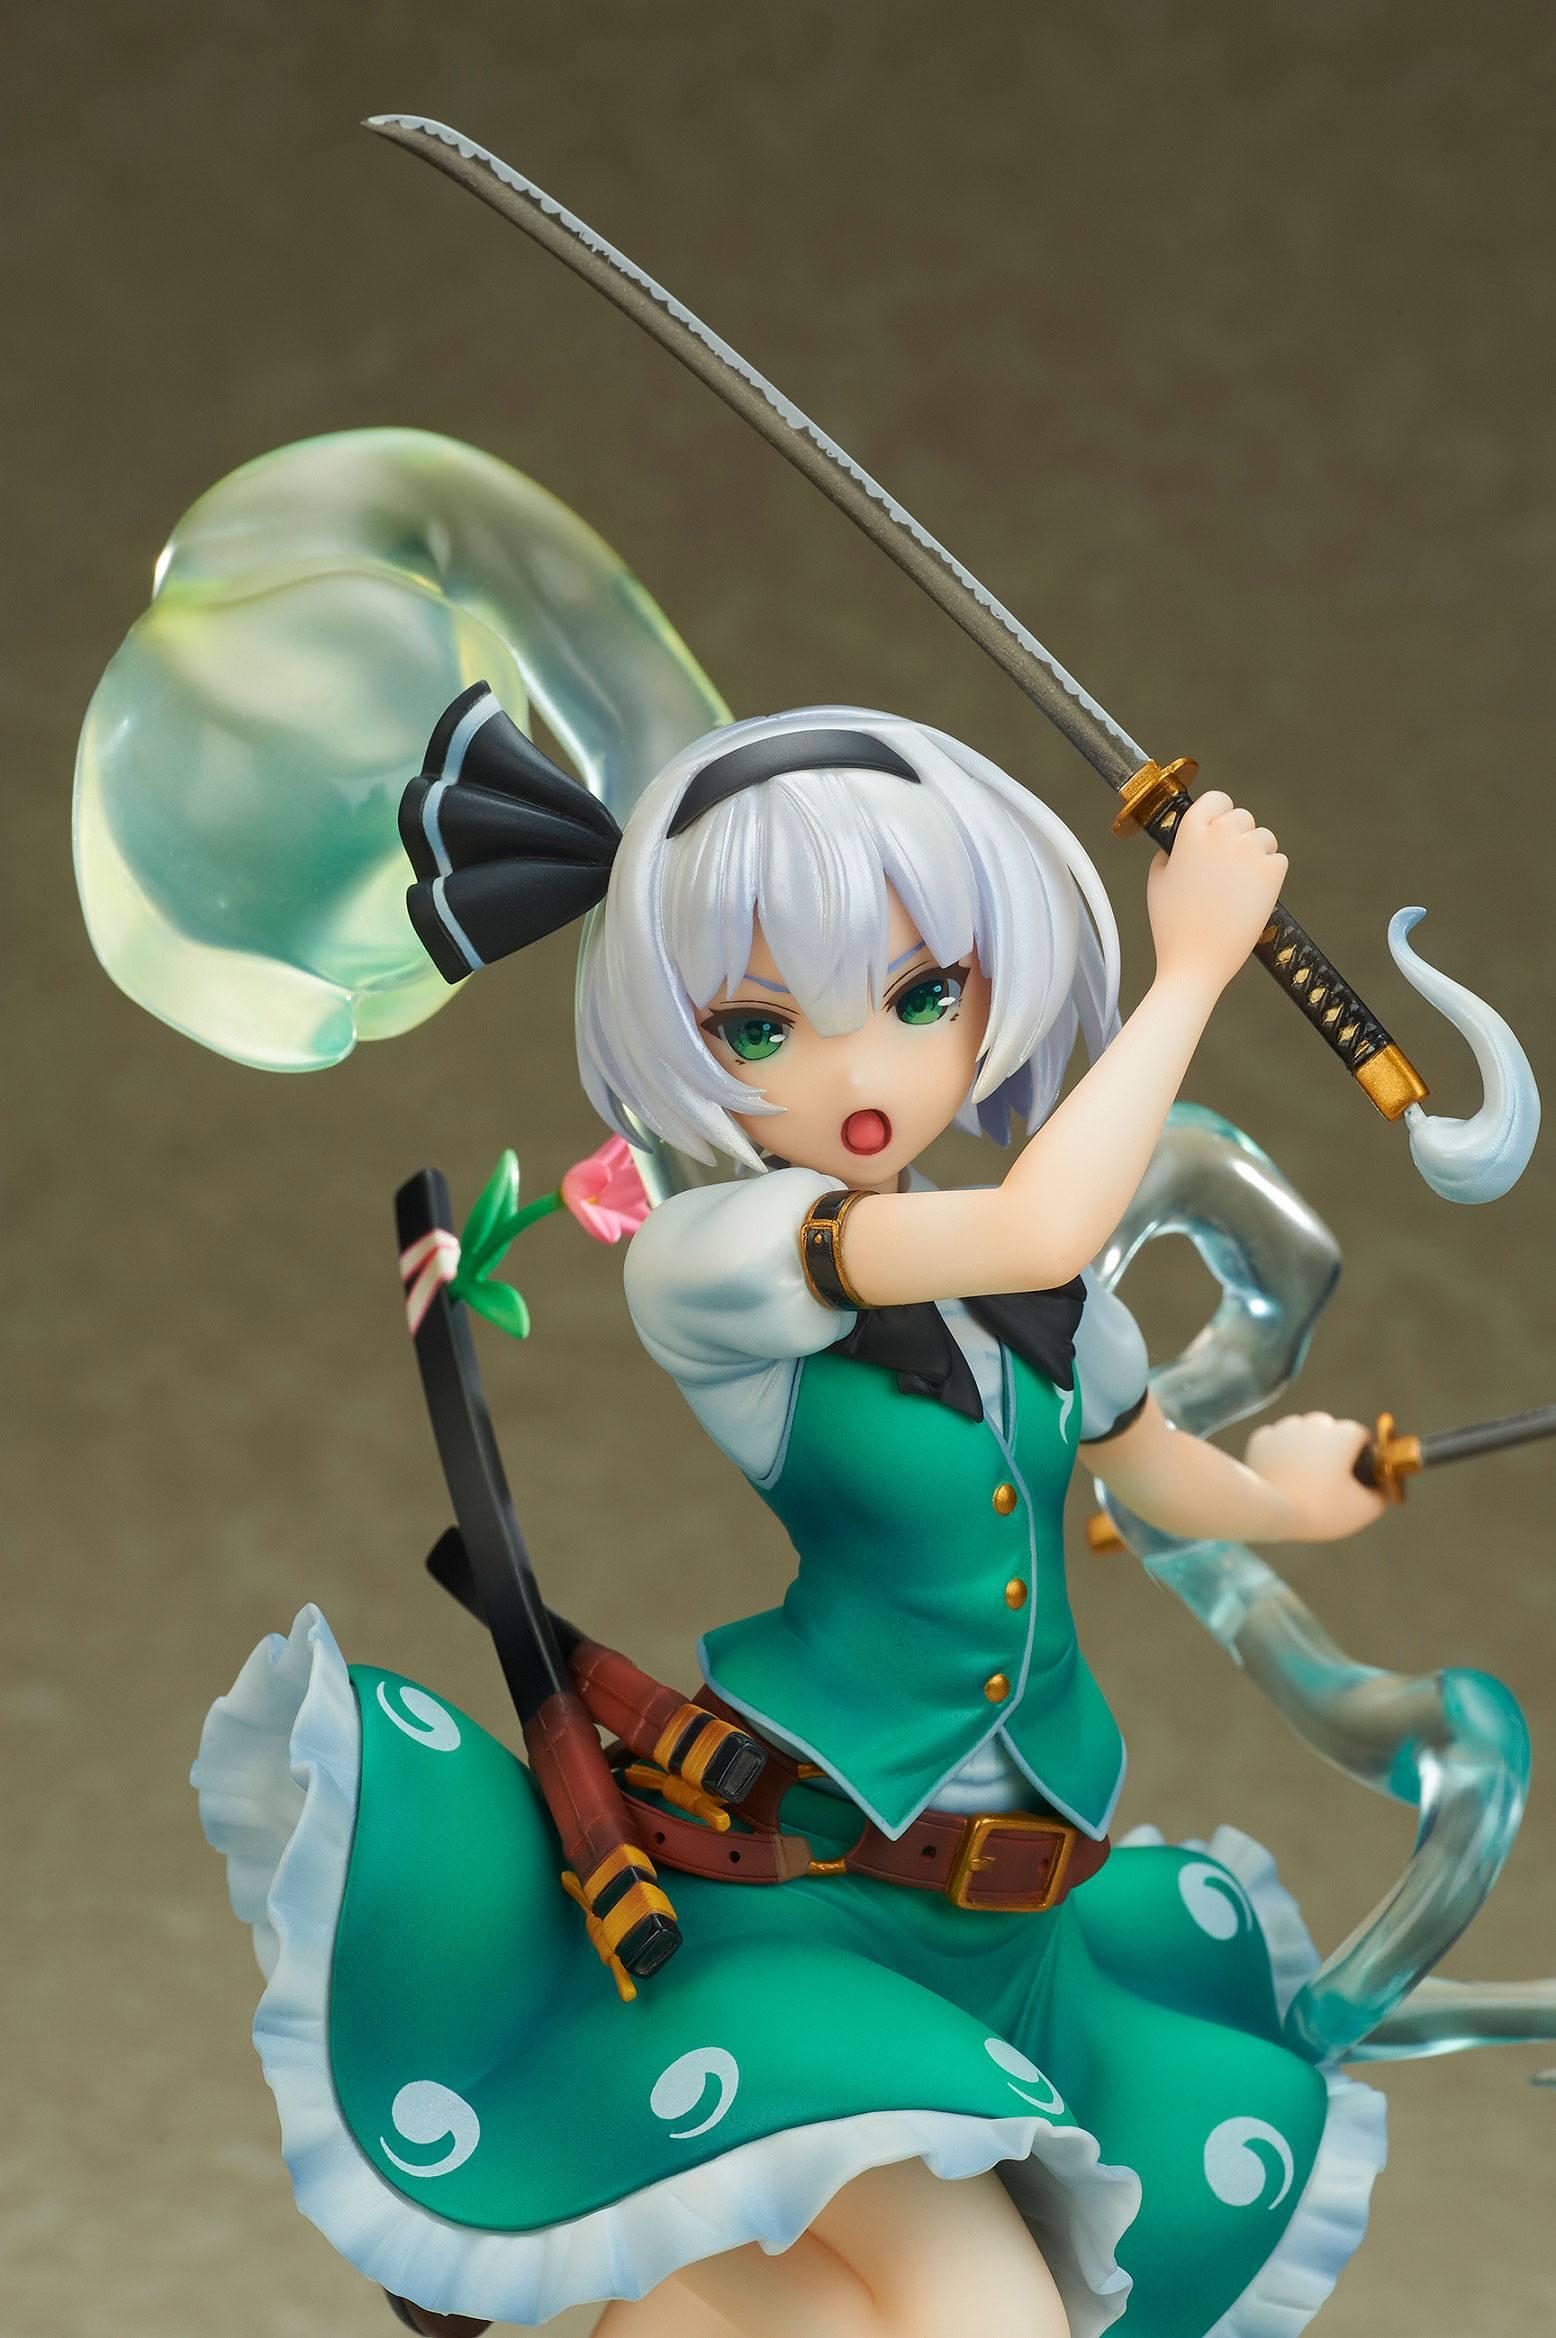 Touhou Project Statue Youmu Konpaku 20 cm - Animegami Store